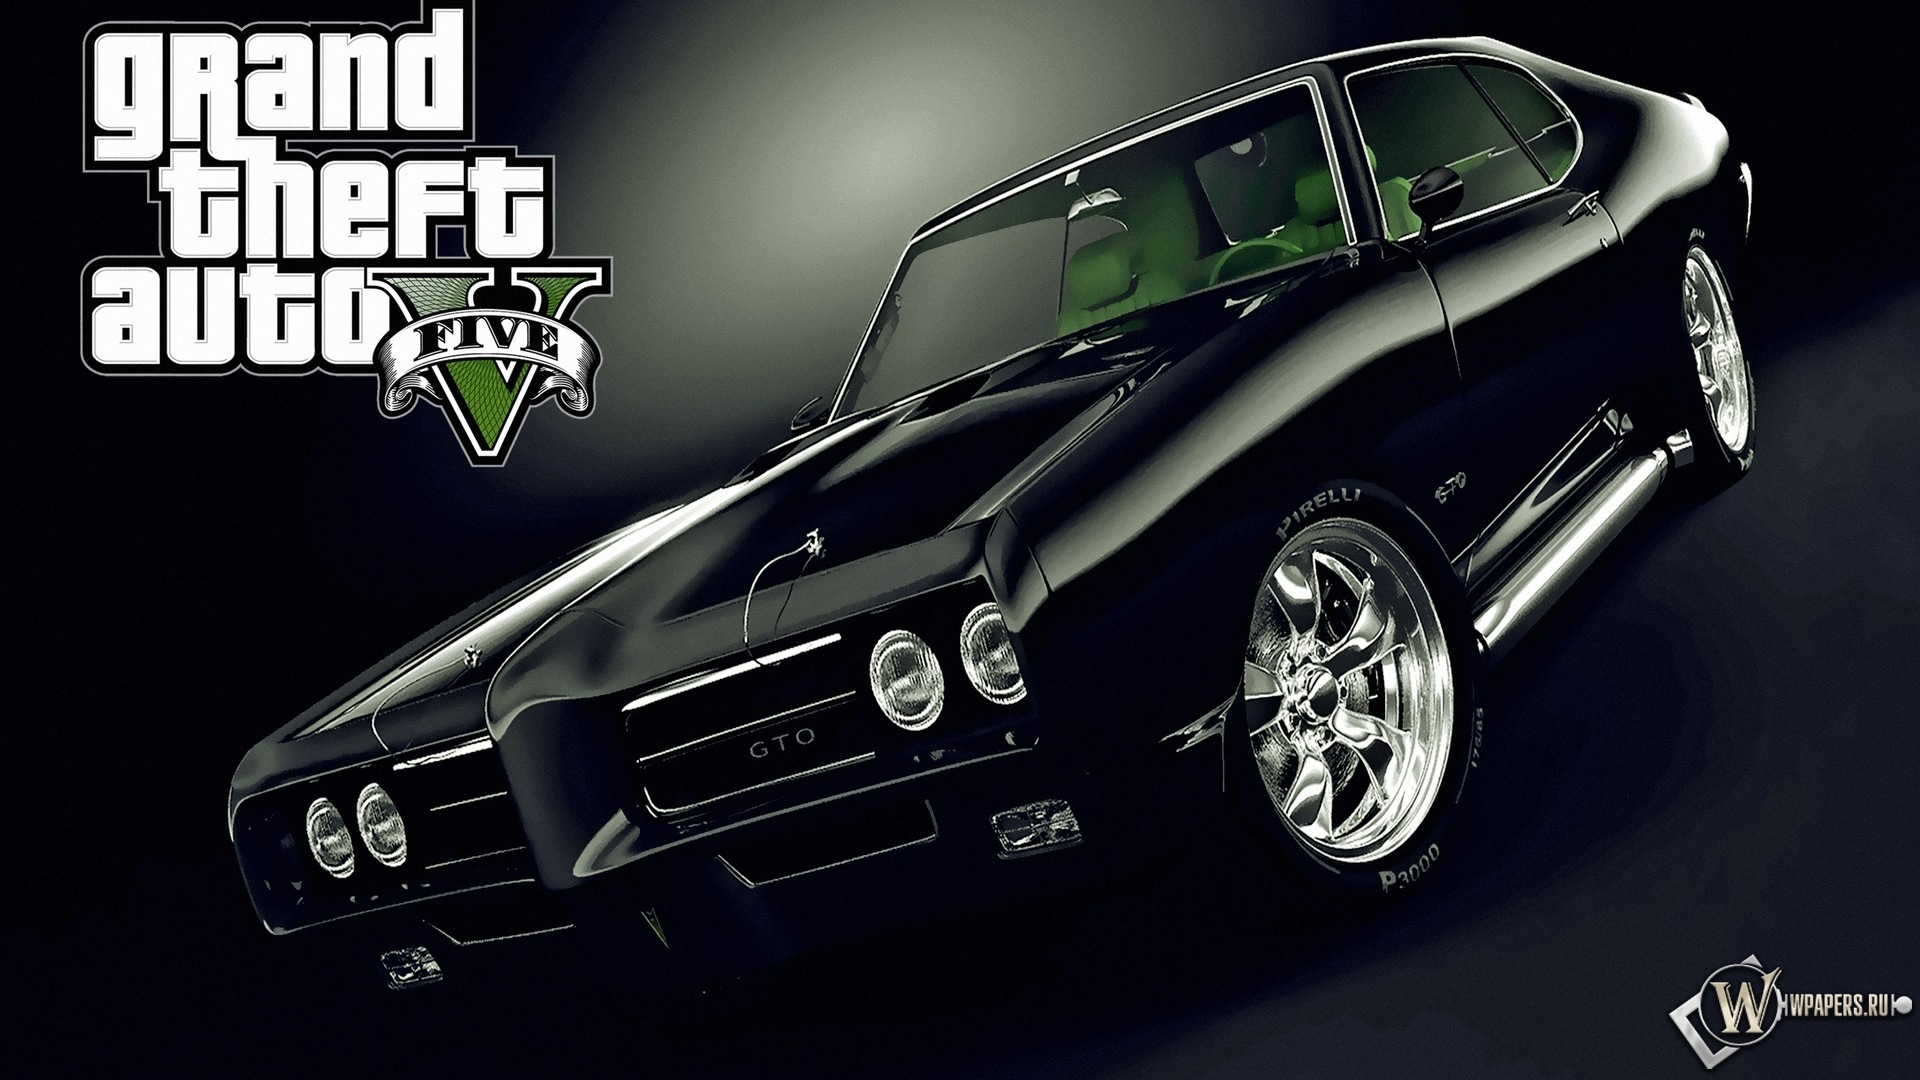 Grand Theft Auto V GTA 5 HD Spiel Wallpapers #2